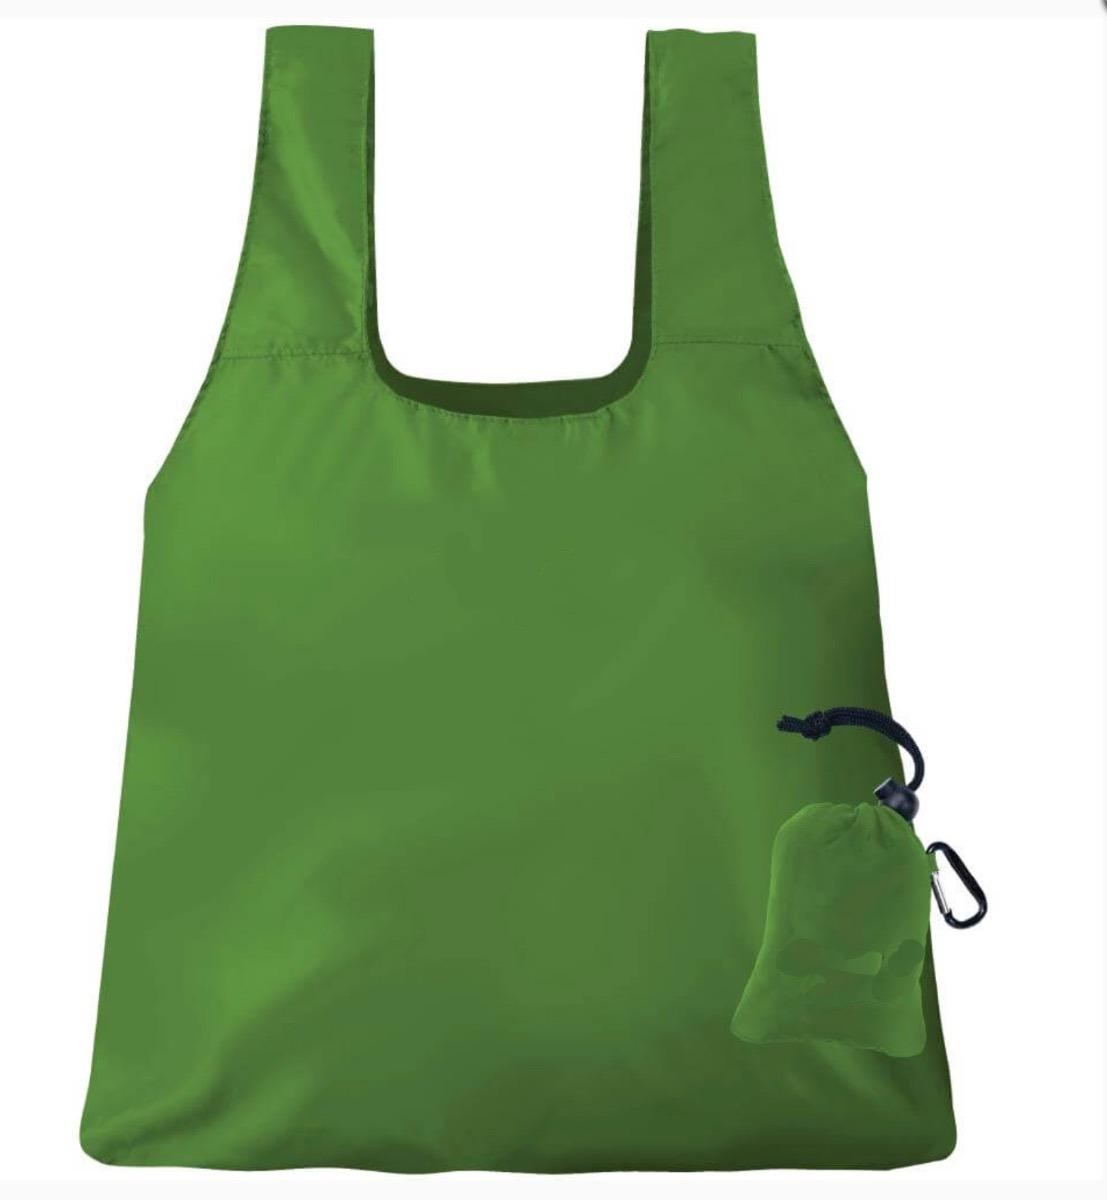 3b01c7d91 Bolsas Reutilizables Ecológicas - $ 100,00 en Mercado Libre